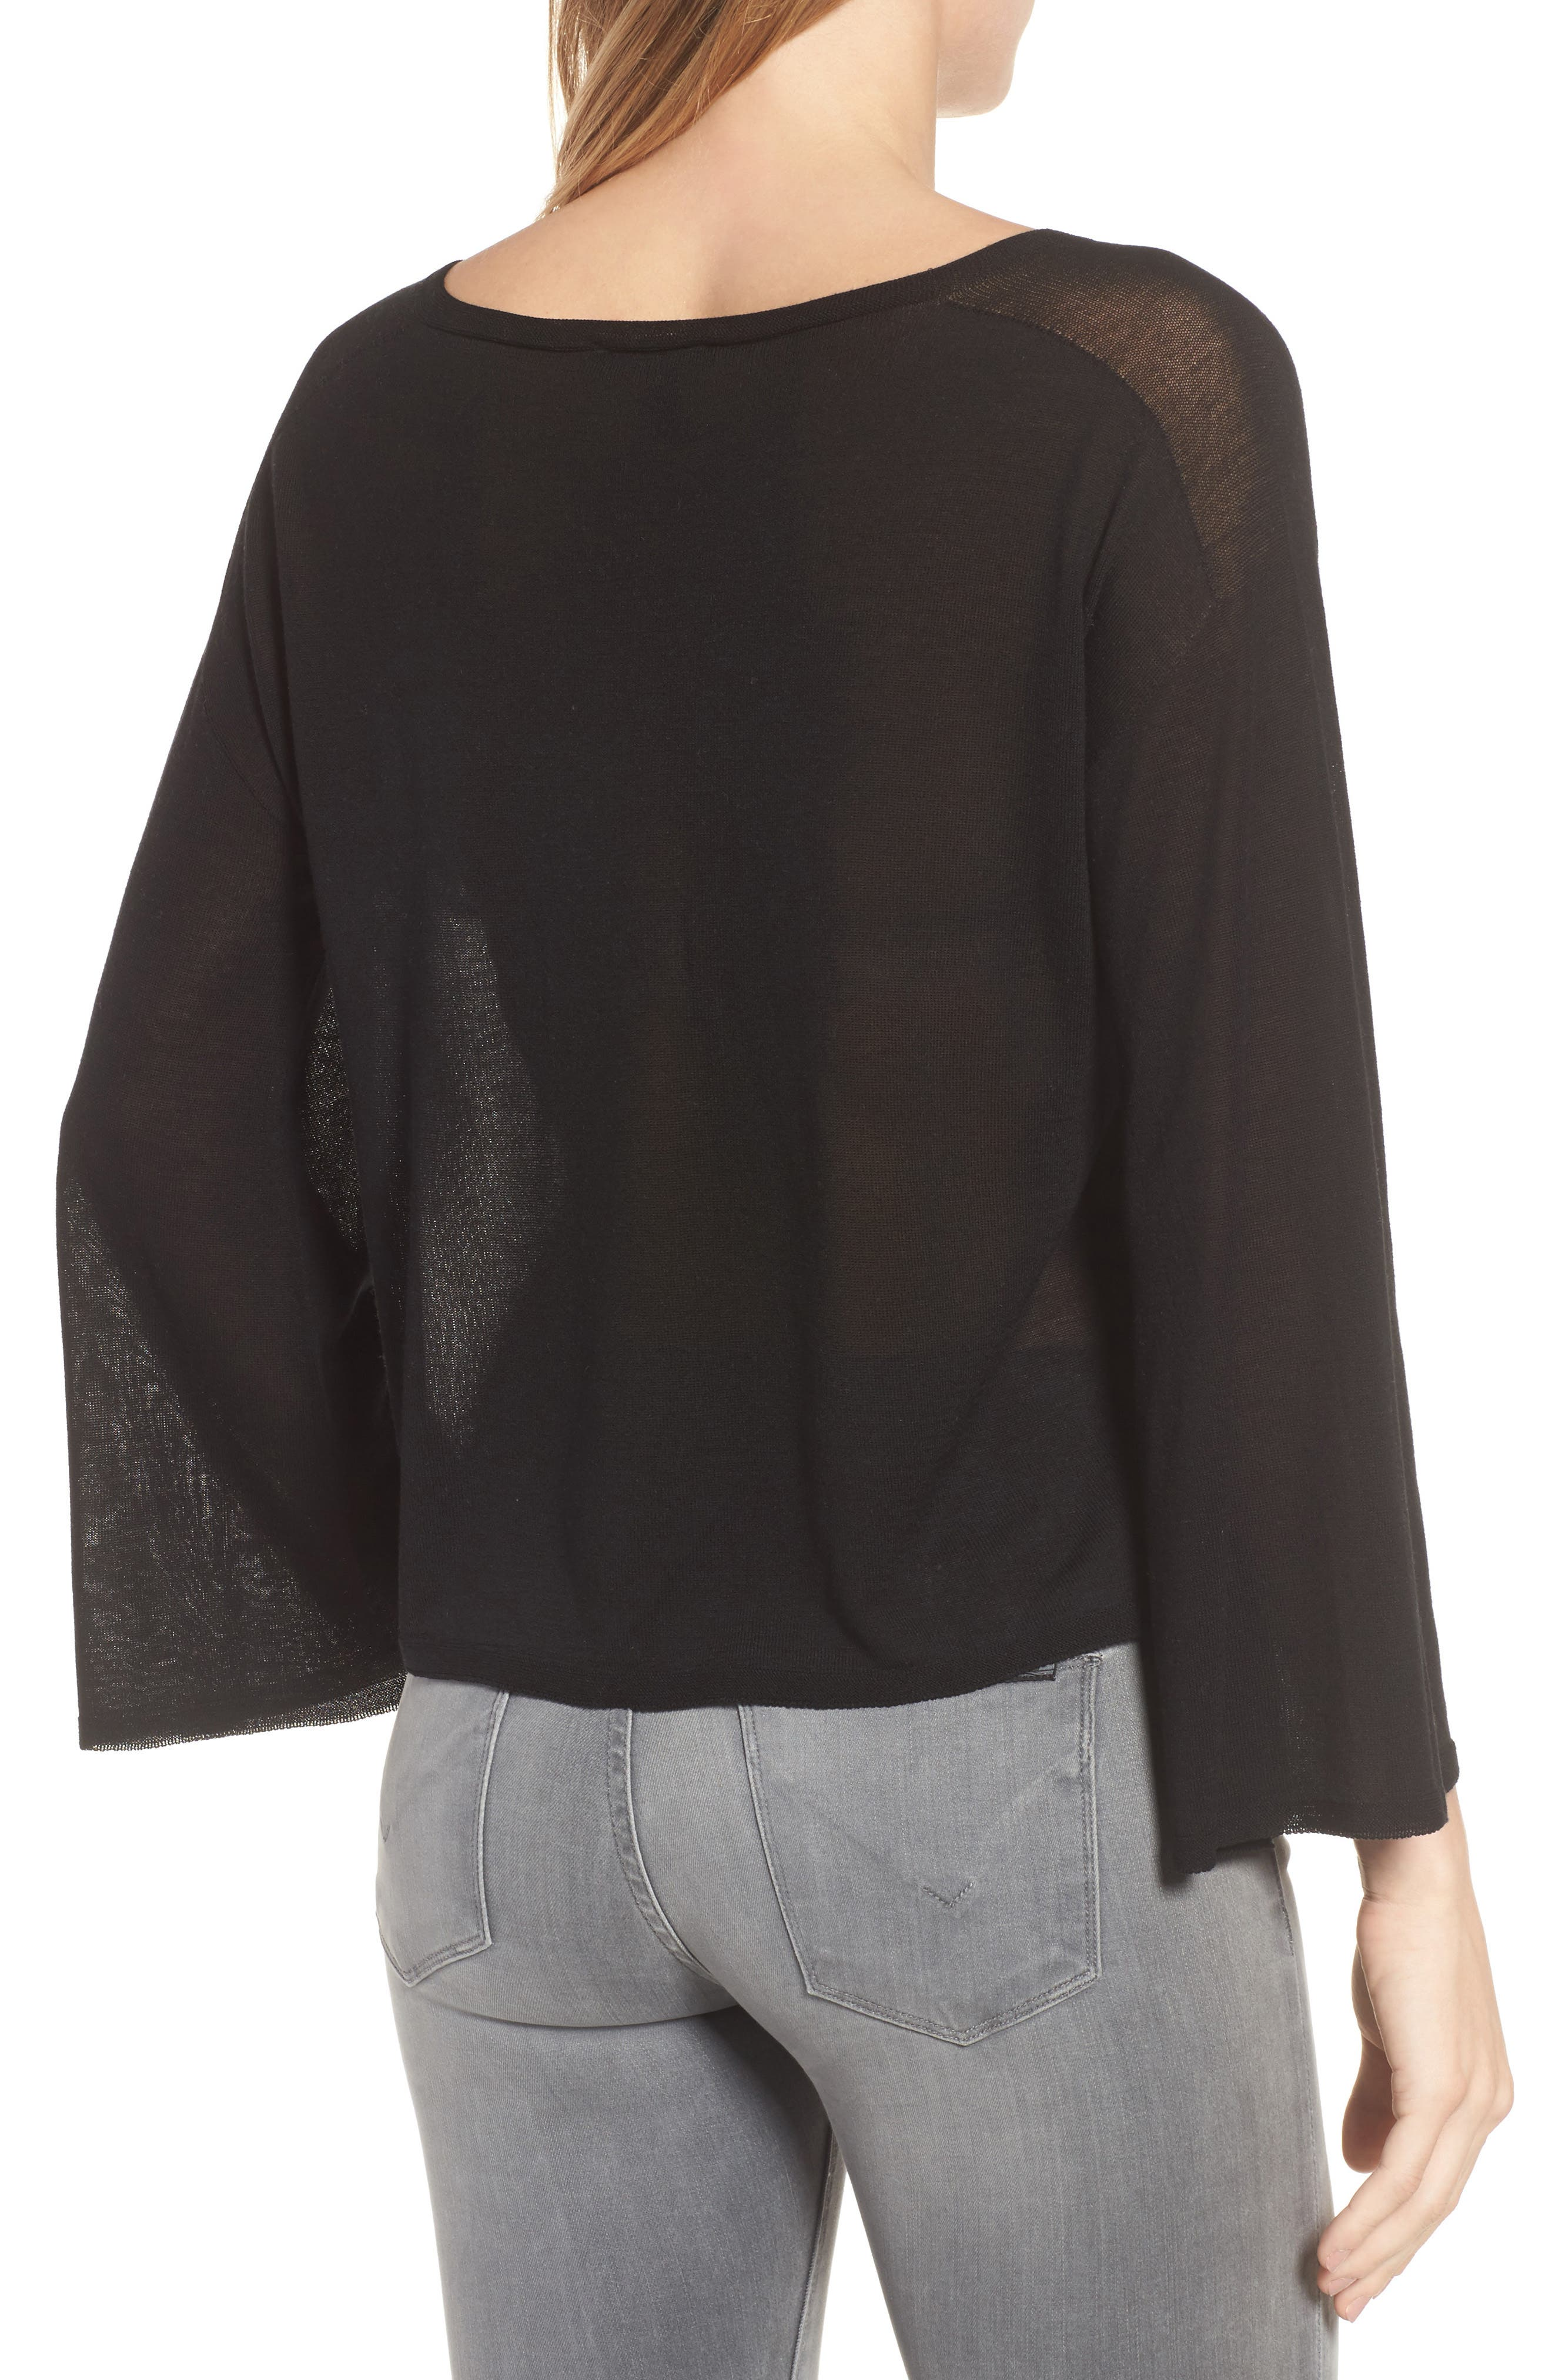 Tencel<sup>®</sup> Lyocell Knit Sweater,                             Alternate thumbnail 2, color,                             Black